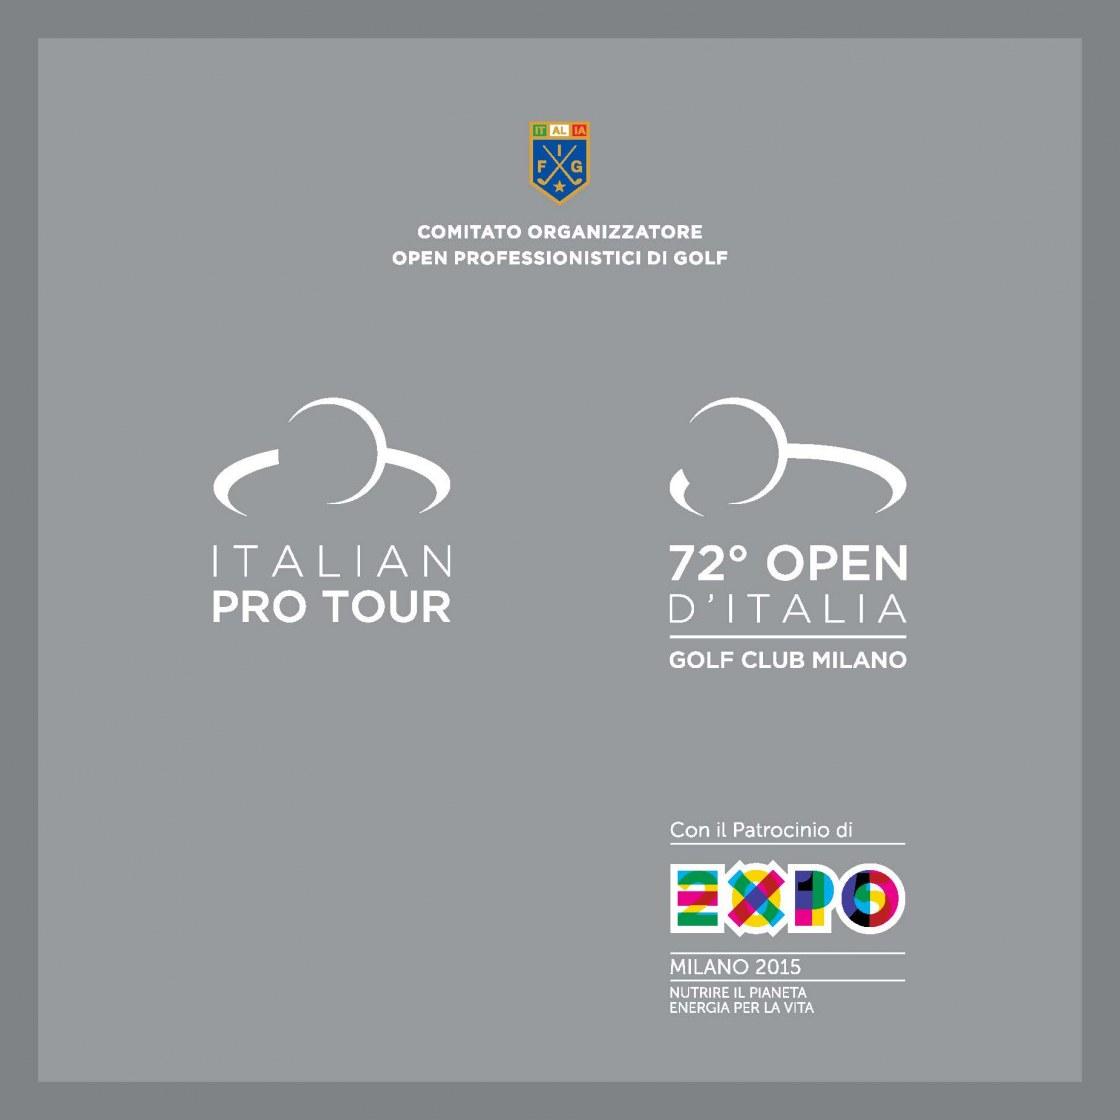 open-ditalia-italian-pro-tour-digit(1)_Pagina_01